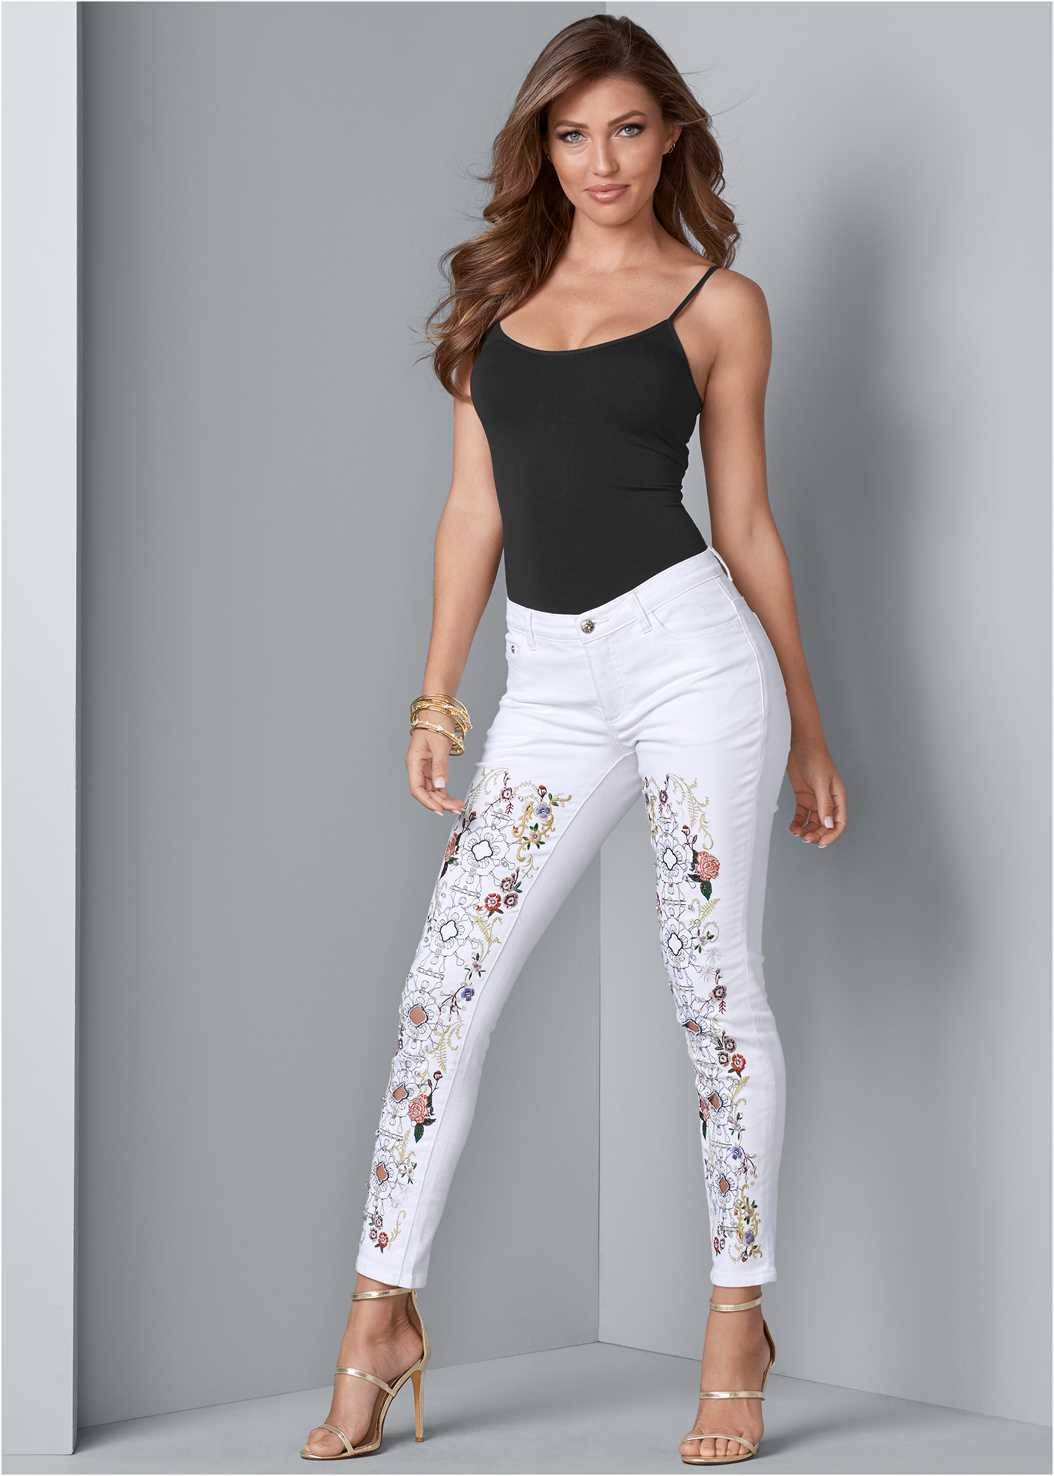 Embellished Jeans,Basic Cami Two Pack,High Heel Strappy Sandals,Fringe Drop Earrings,Raffia Detail Bag